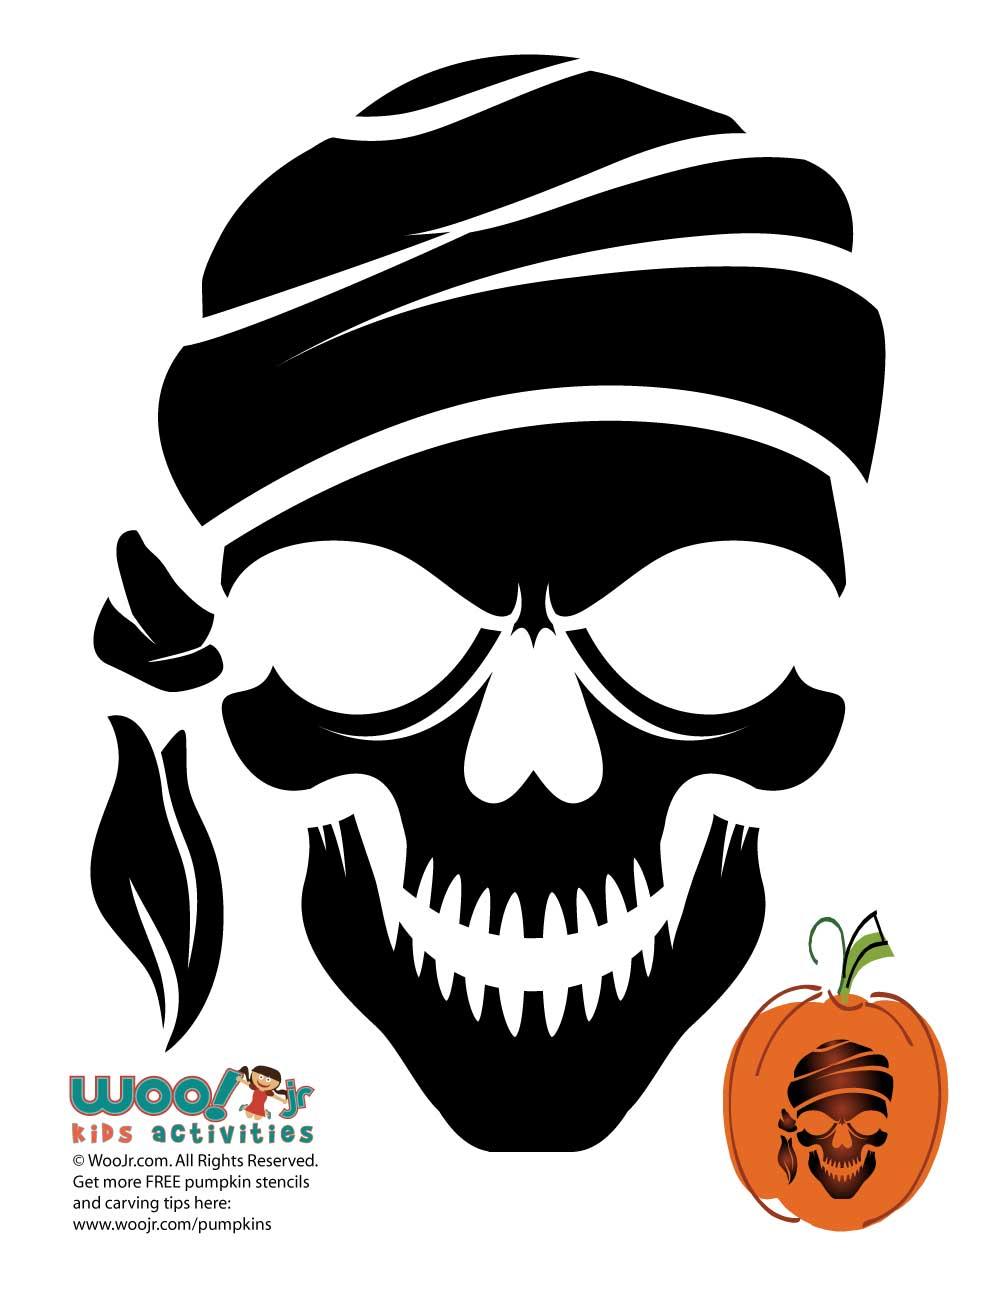 Pirate Skeleton Pumpkin Template | Woo! Jr. Kids Activities